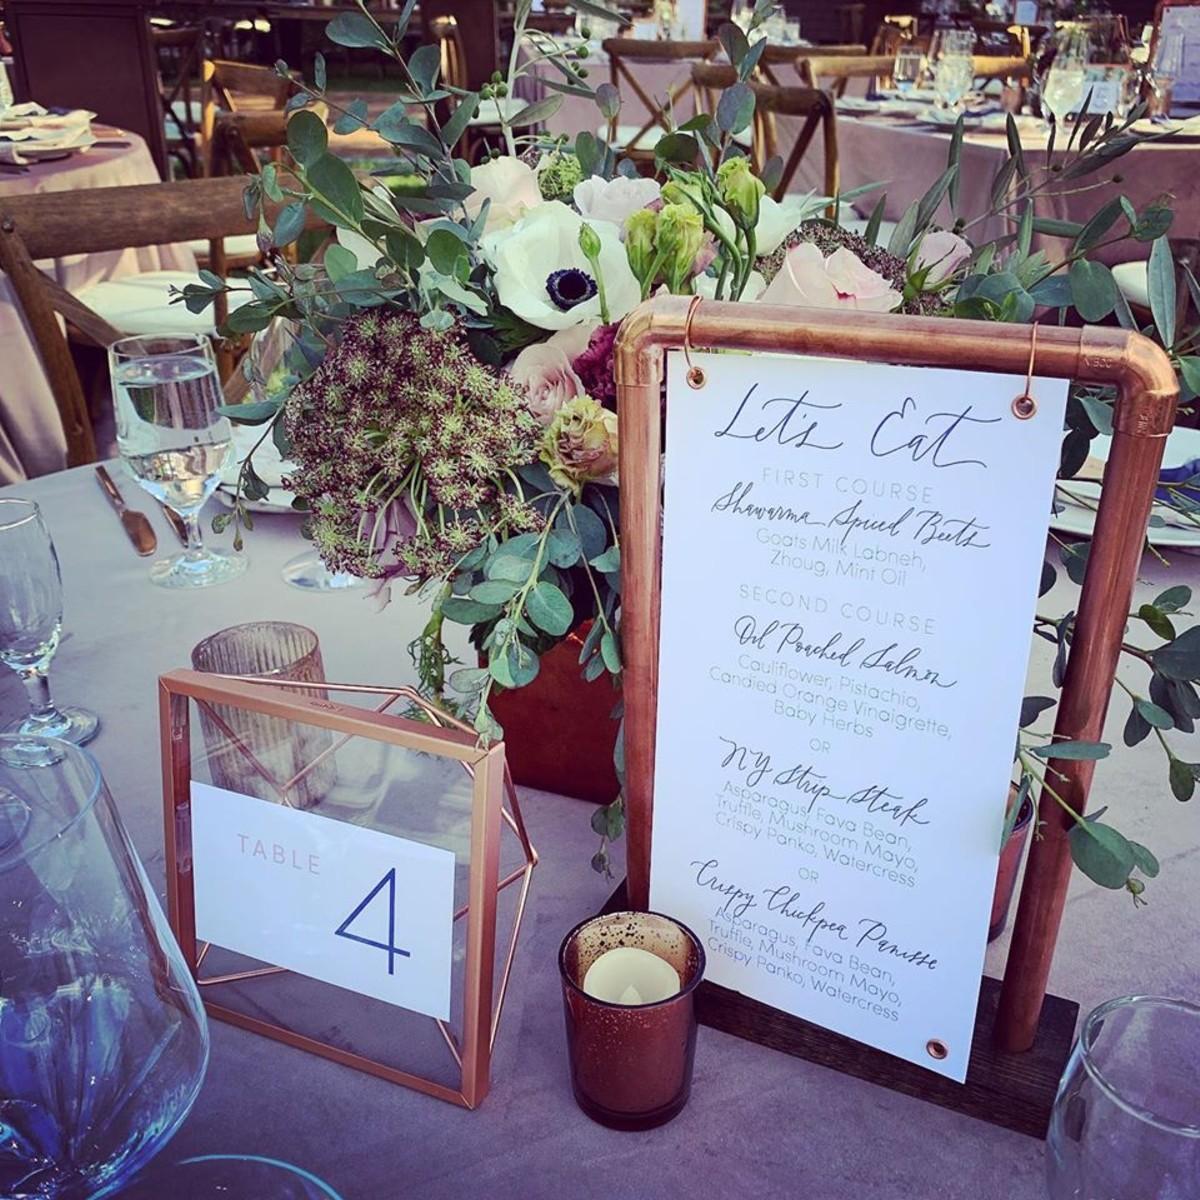 Beau & Arrow Event Co. - Lake Tahoe Wedding Planner - table signage